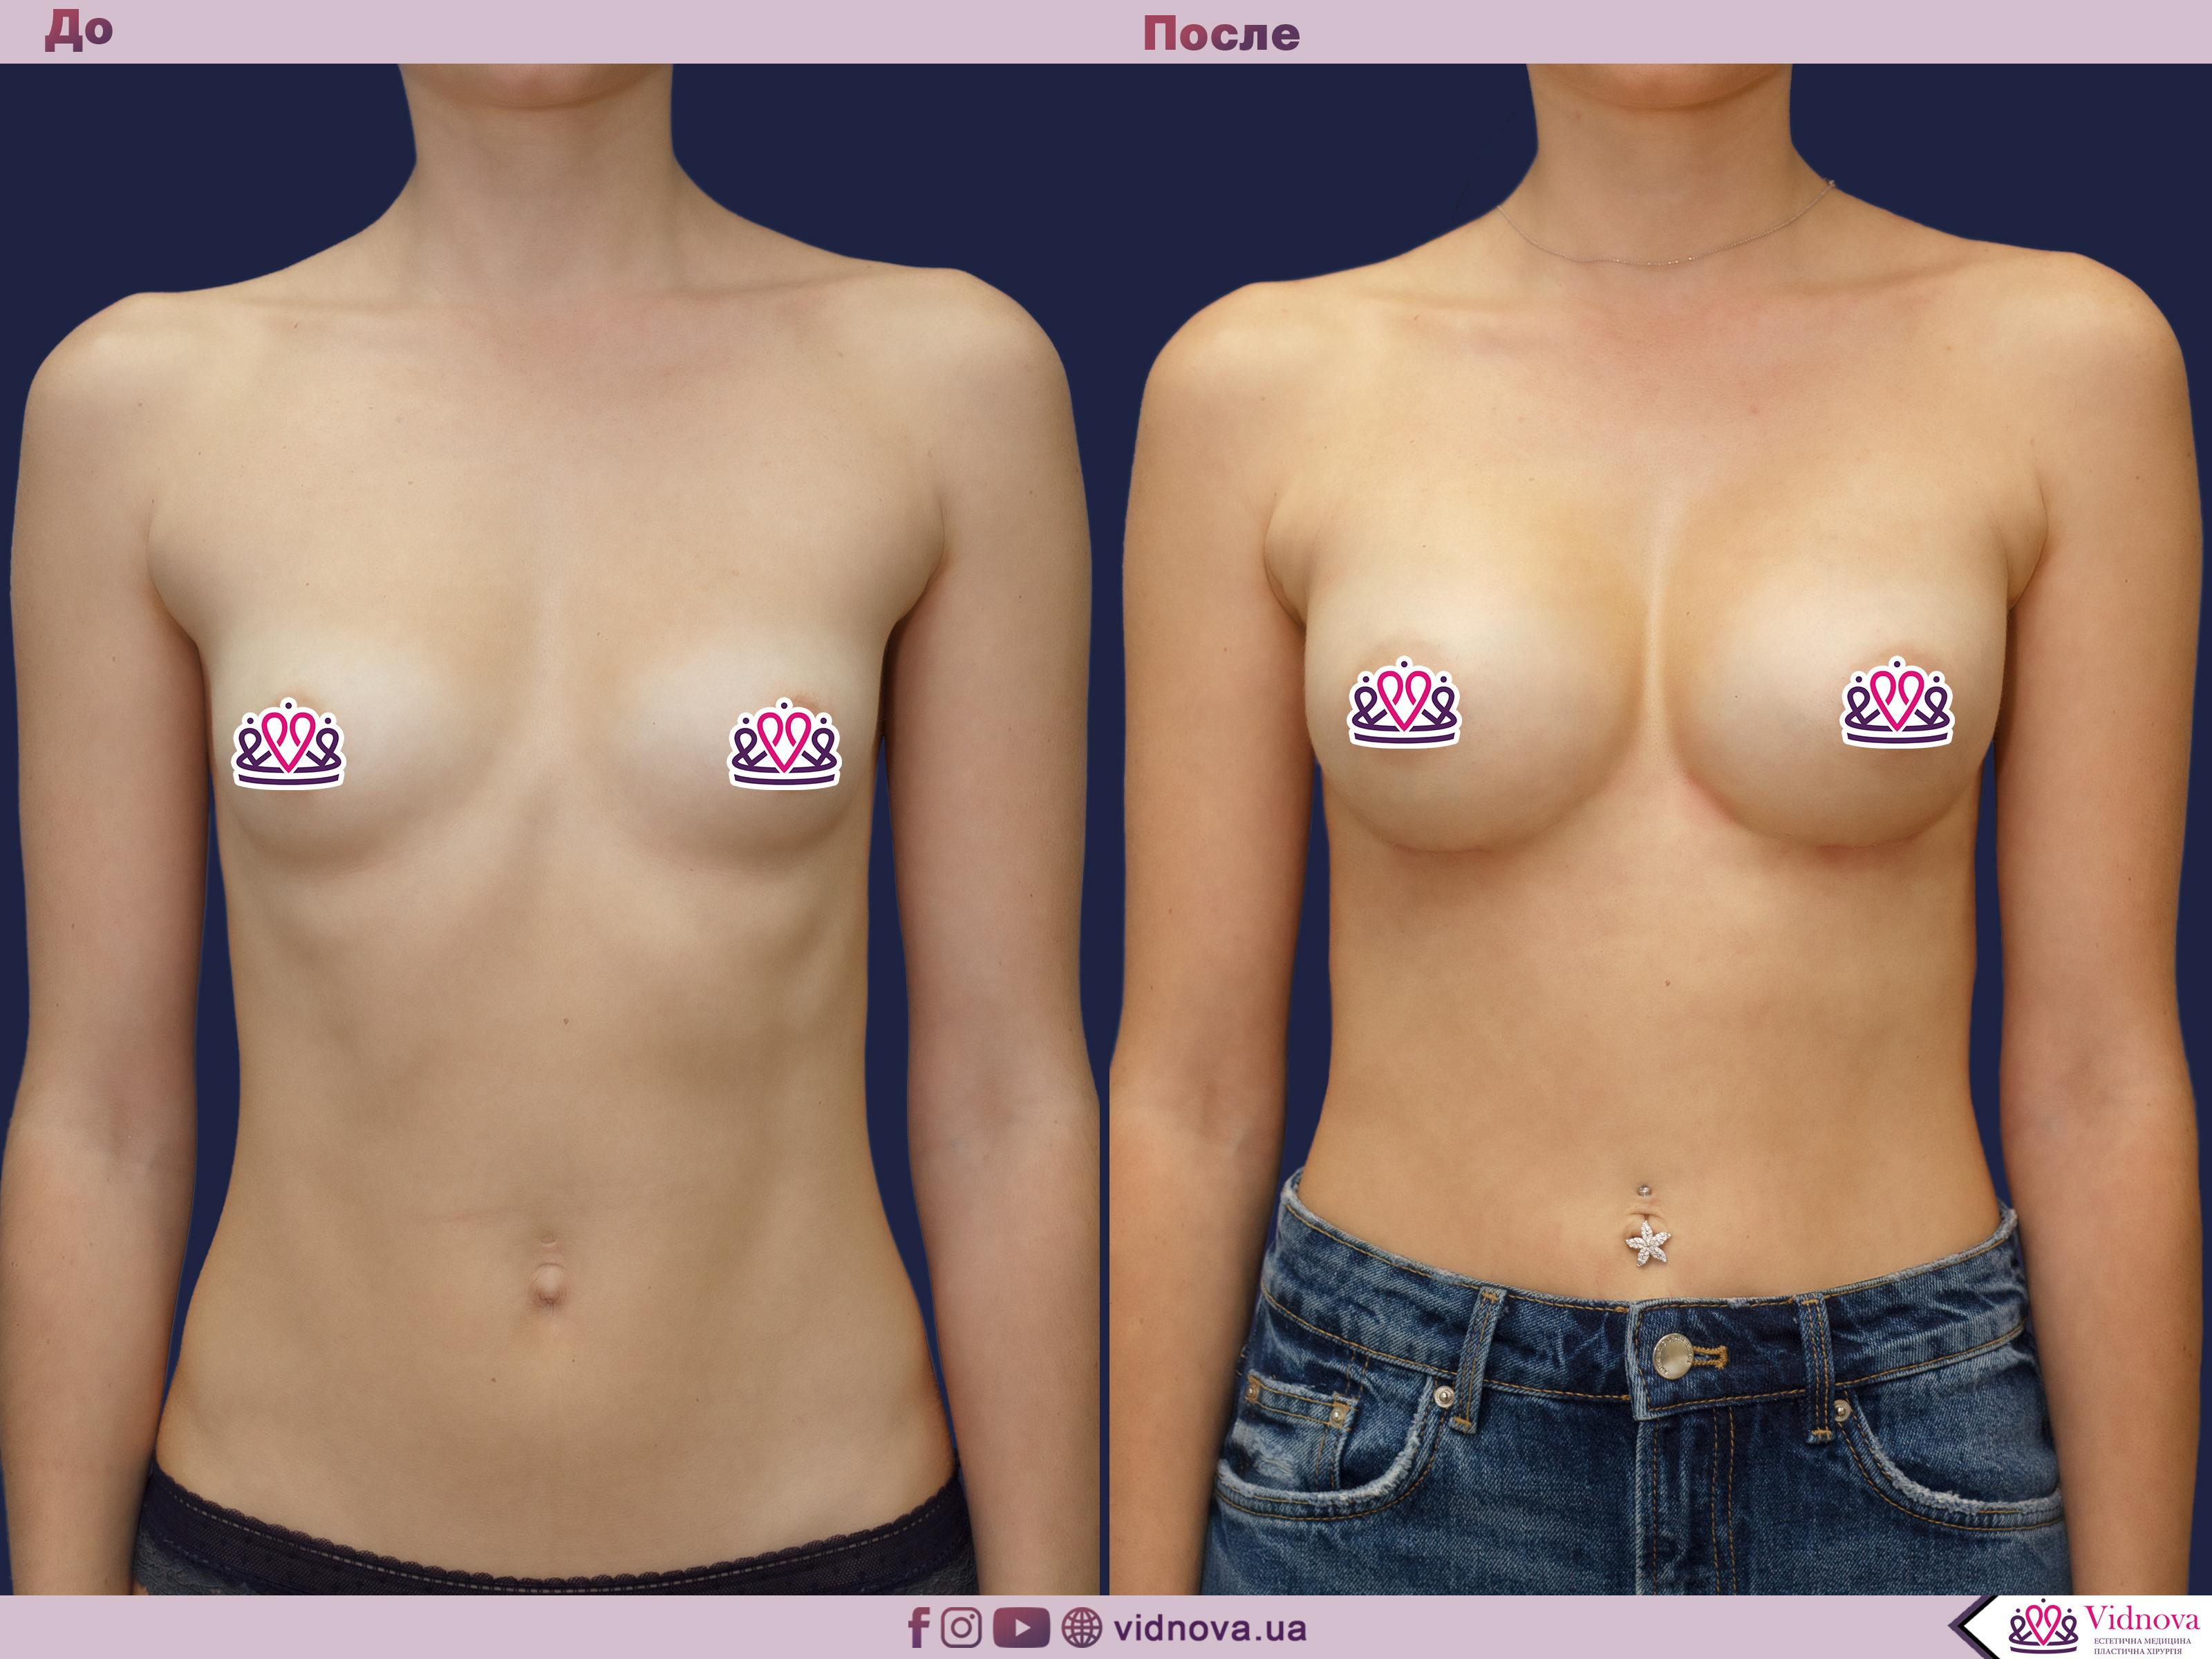 Увеличение груди: Фото ДО и ПОСЛЕ - Пример №56-1 - Клиника Vidnova